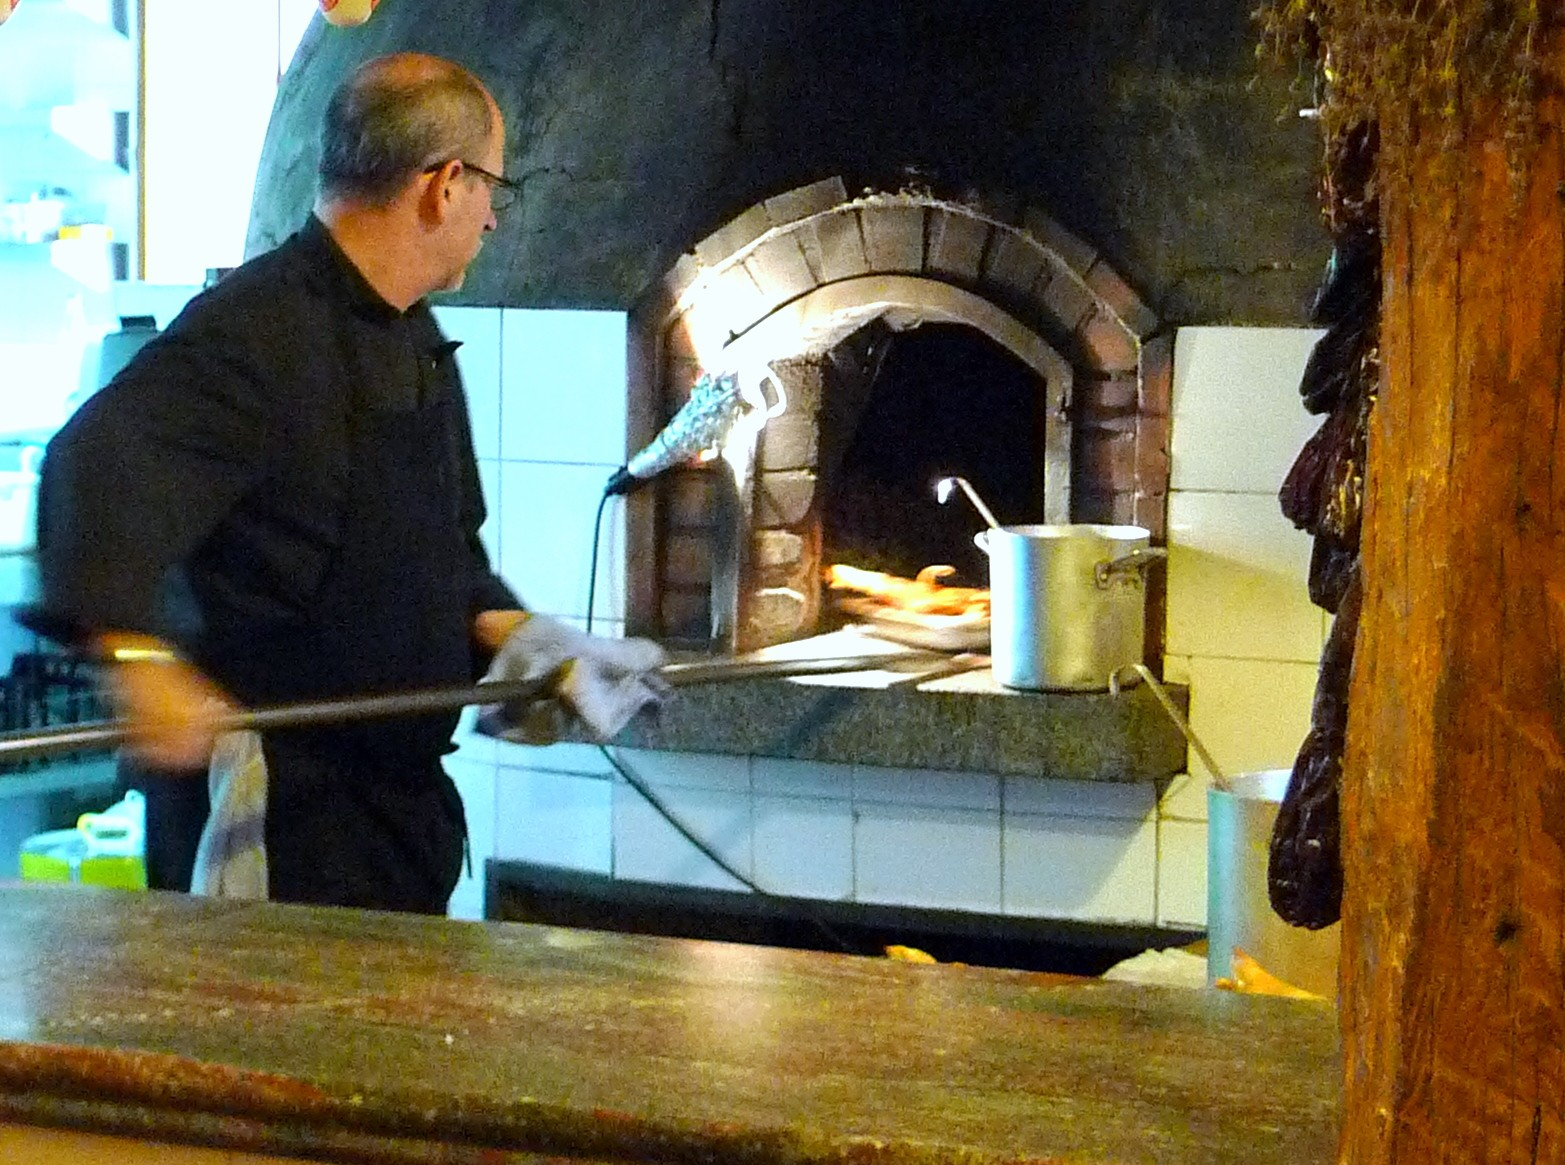 Cursos de cocina gratis en segovia - Cursos de cocina barcelona gratis ...